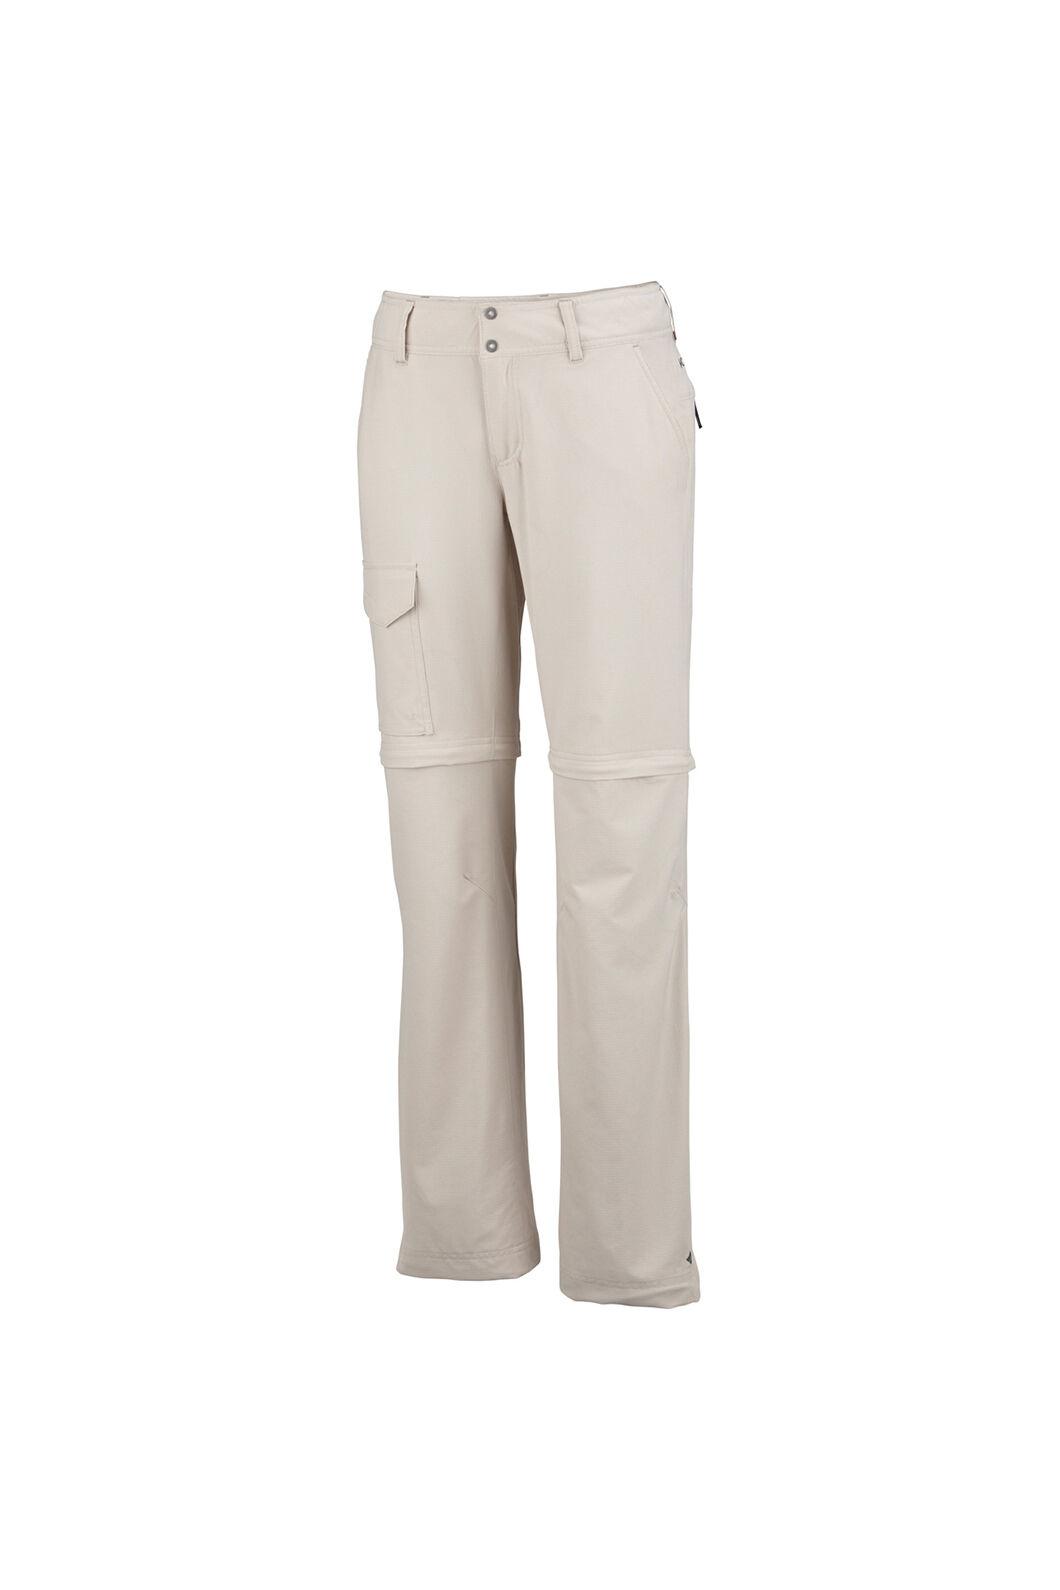 Columbia Women's  Ridge Convertible Pants, Grill, hi-res